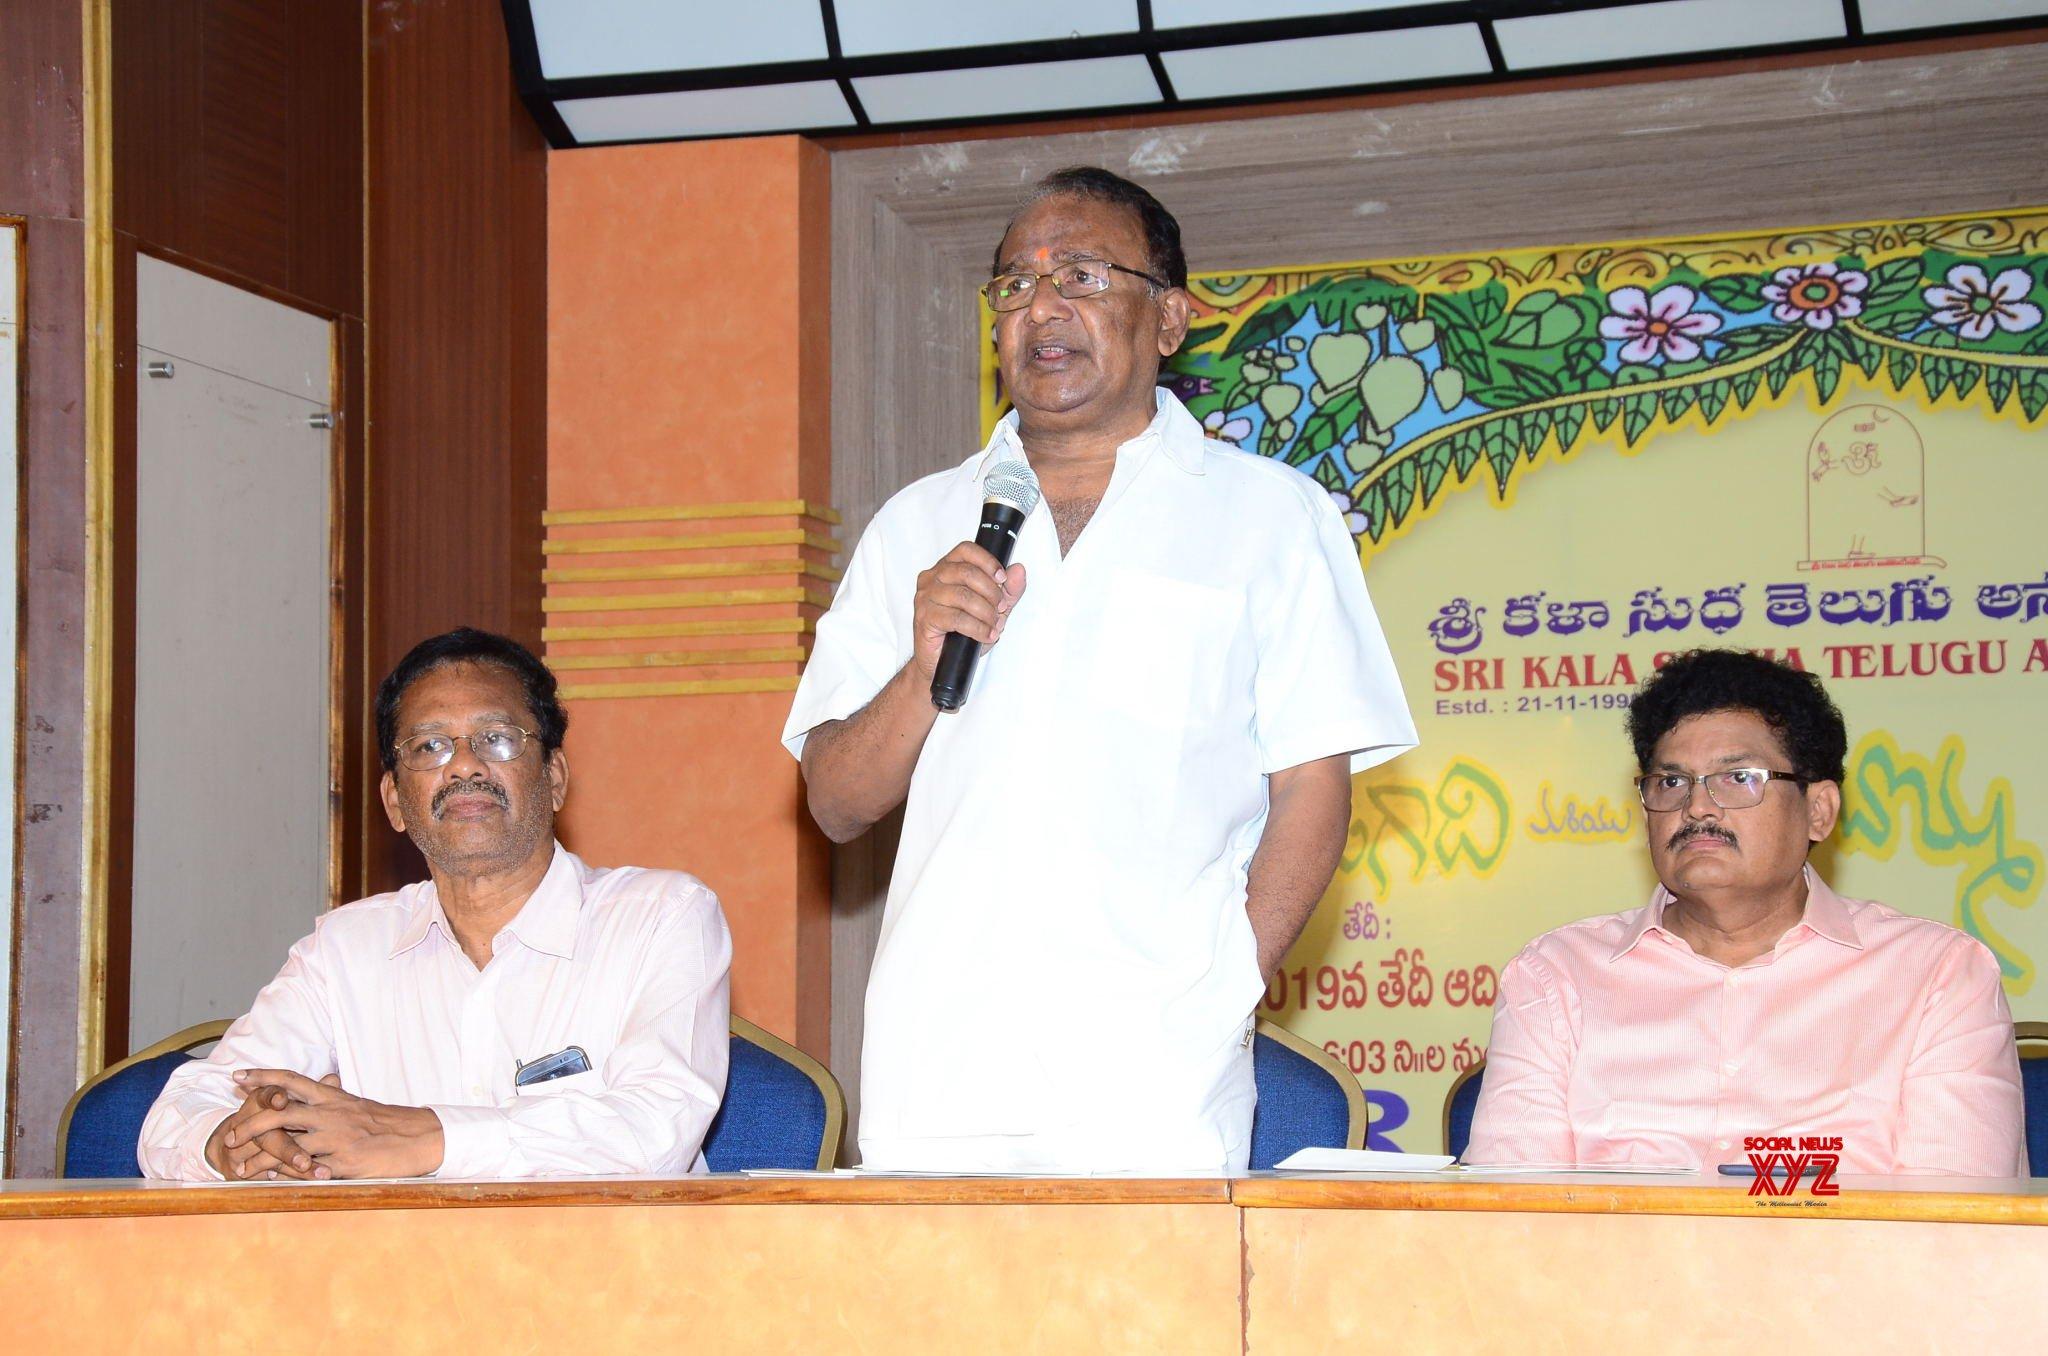 Sri Sudha Gallery in 2019 Latest Telugu Movie Reviews New